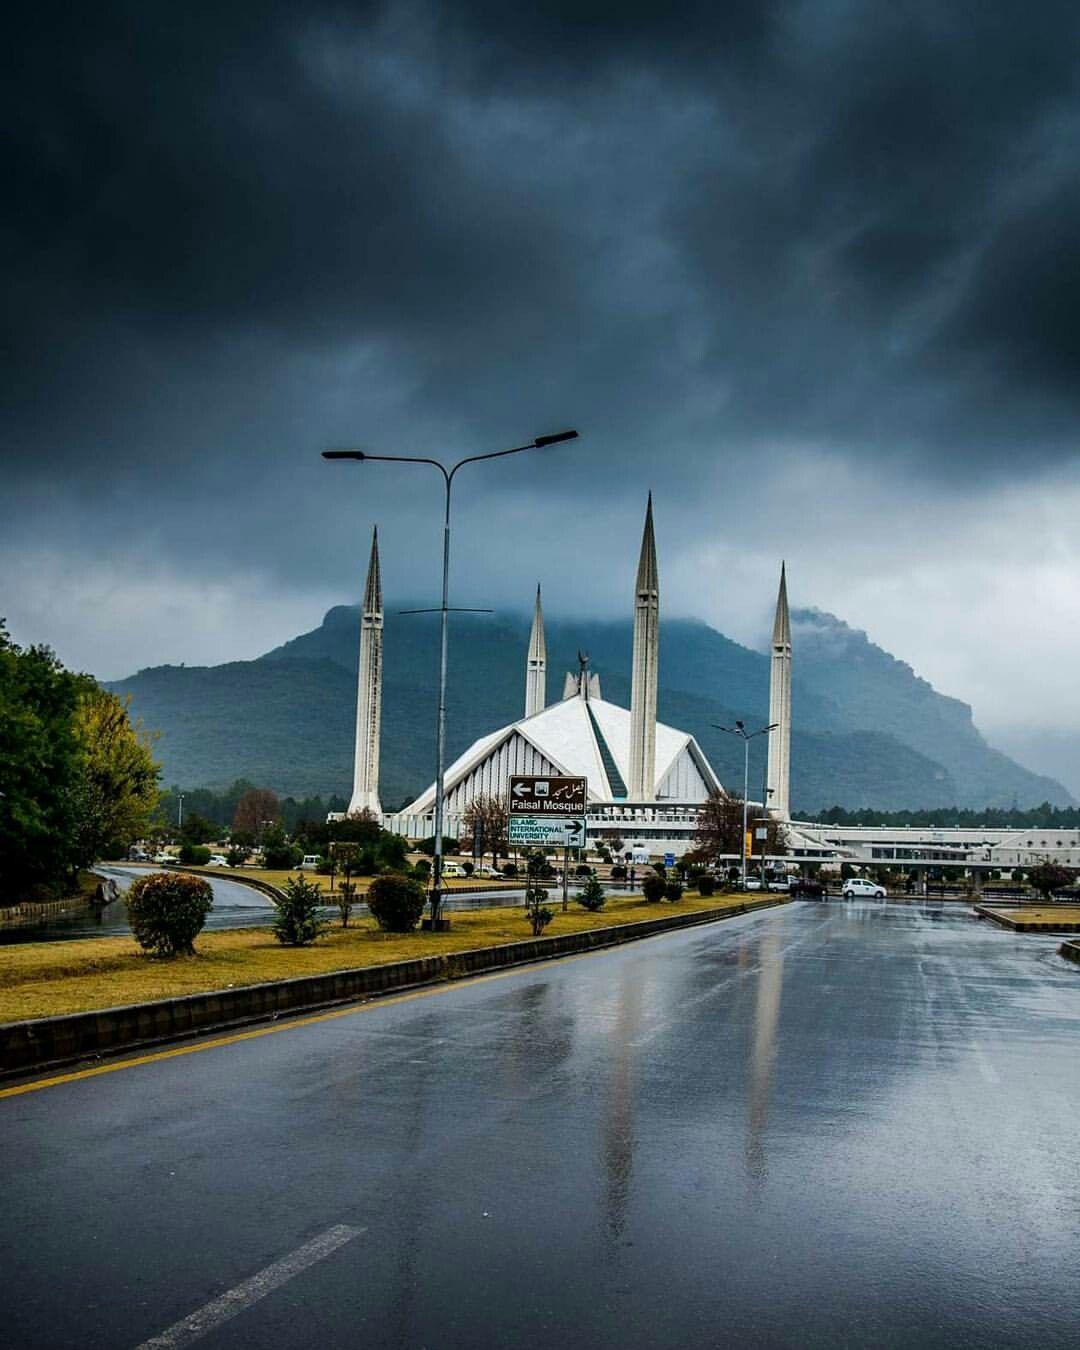 Faisal Masjid Islamabad Pakistan Tourism Islamabad